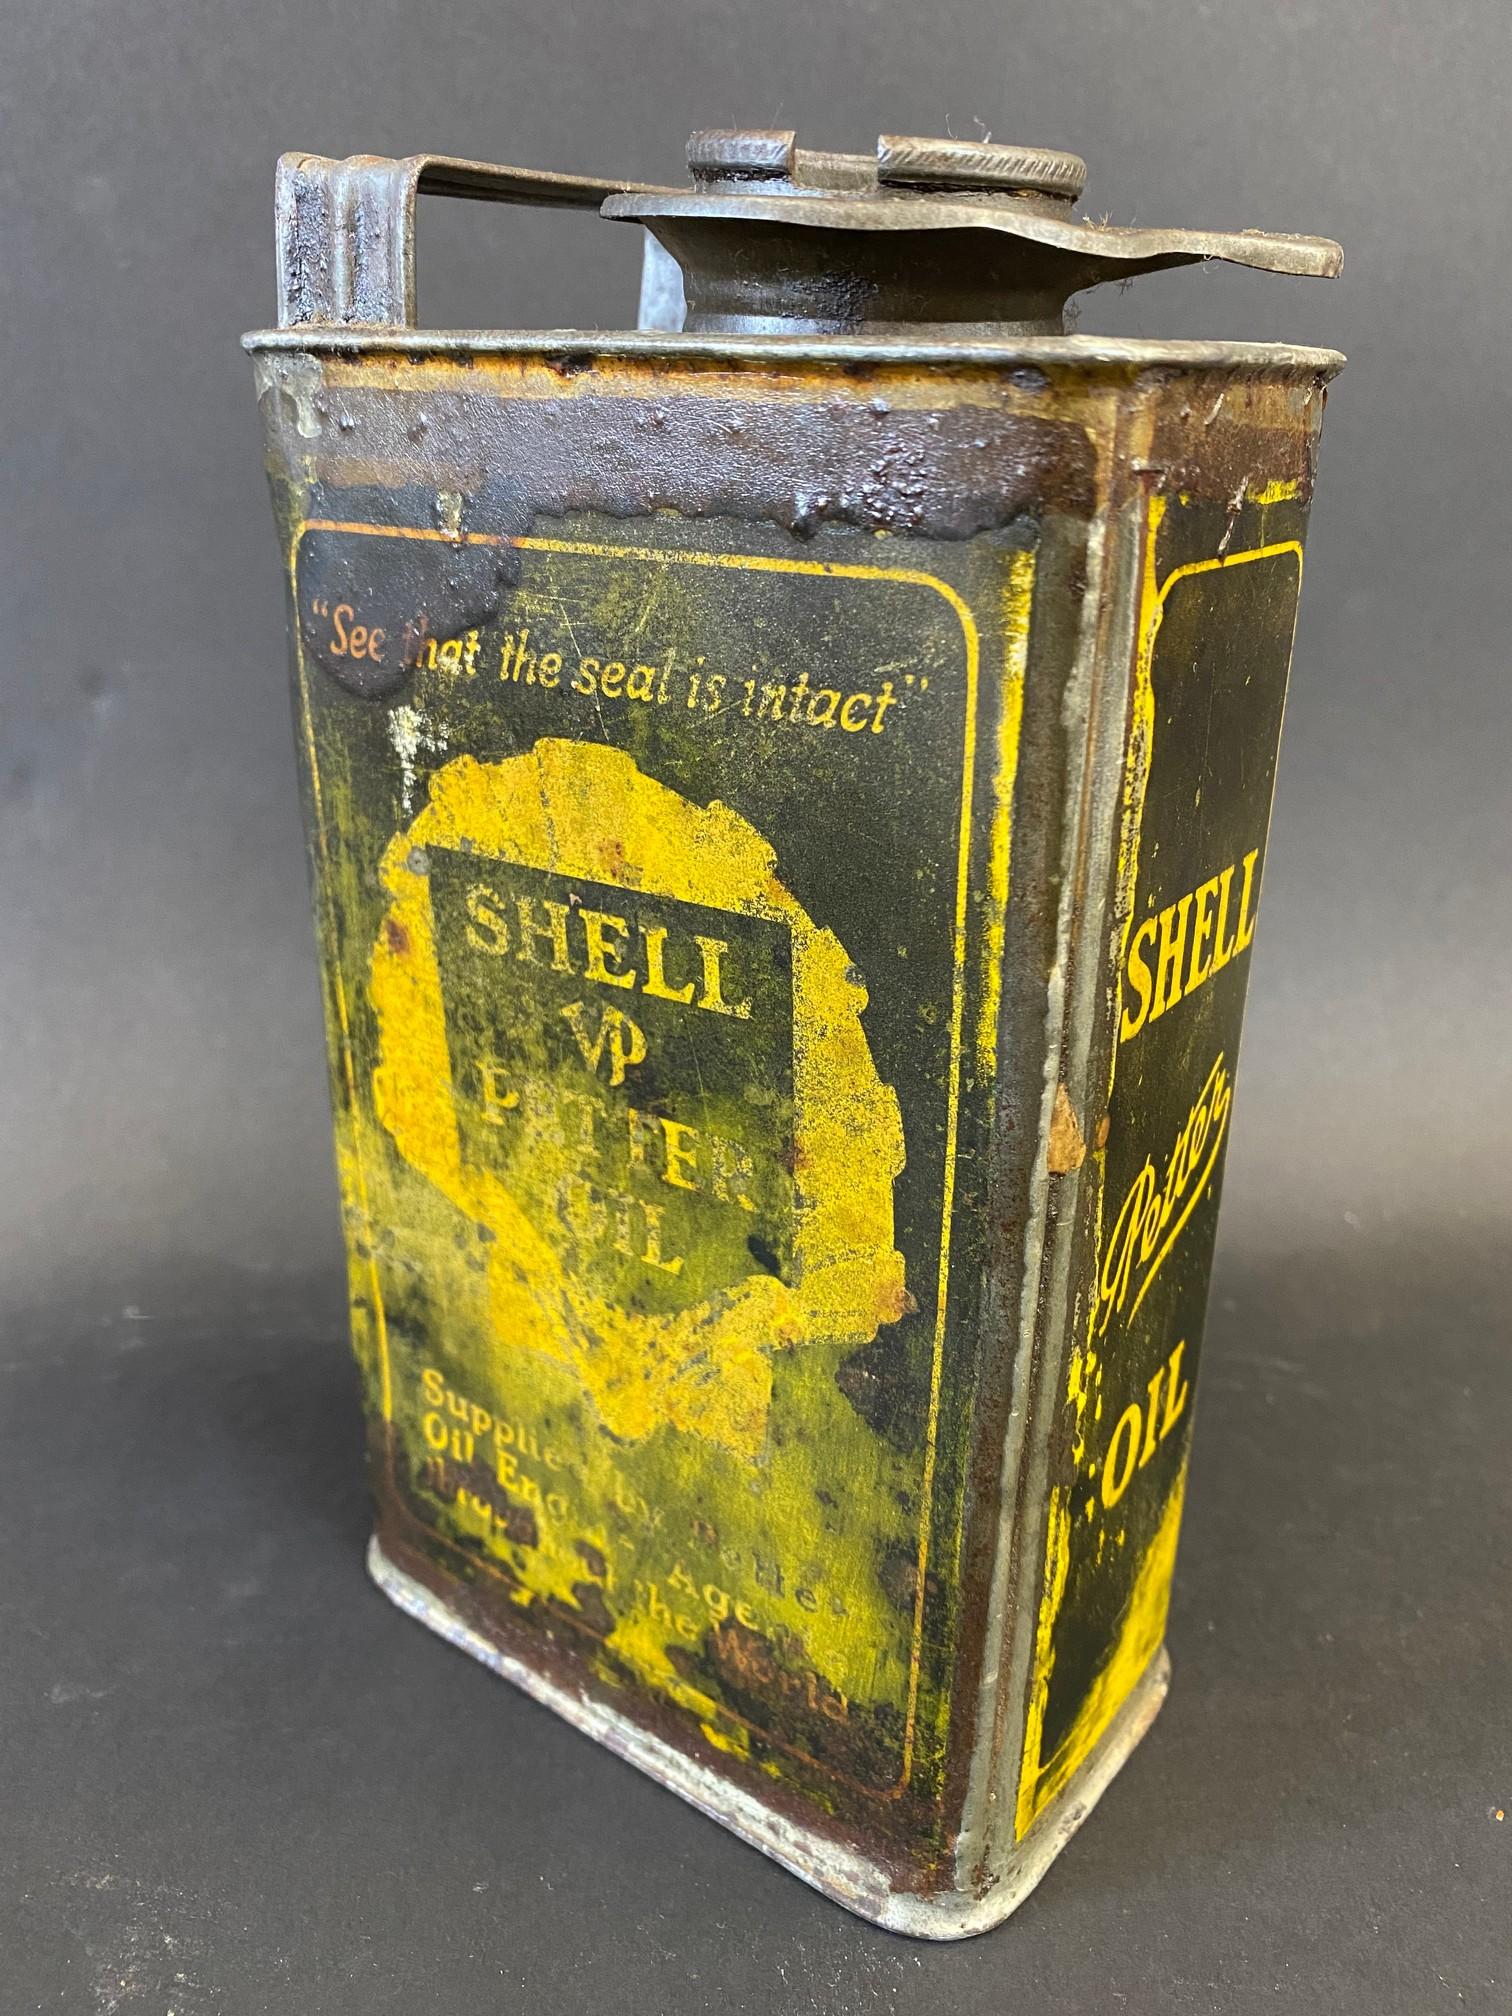 A Shell 'Petter' Oil rectangular quart can. - Image 2 of 4